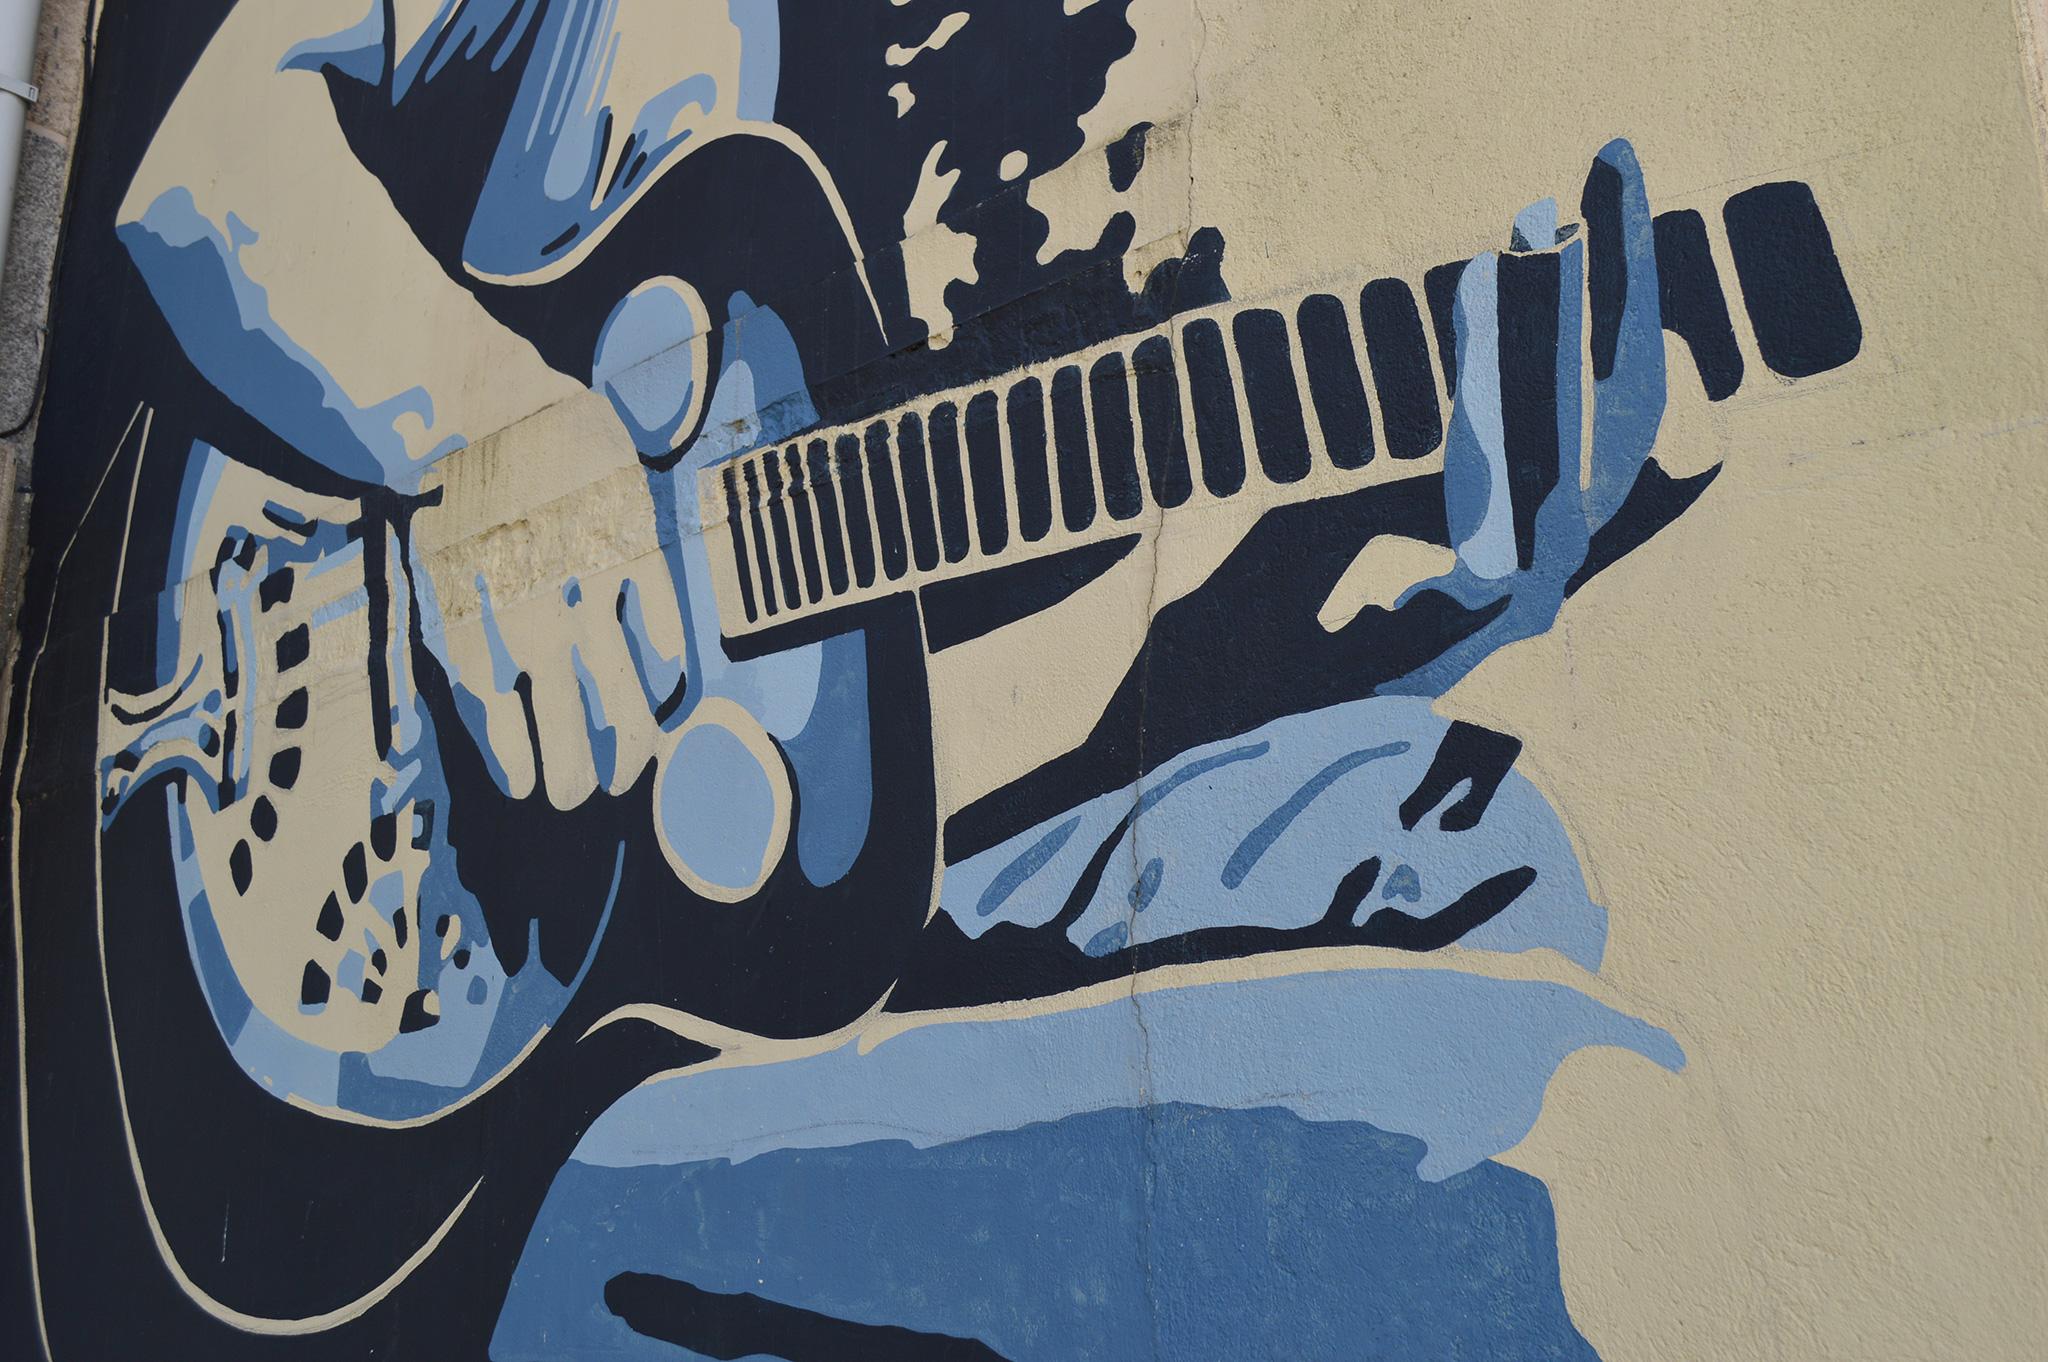 Foto principal mural O músico